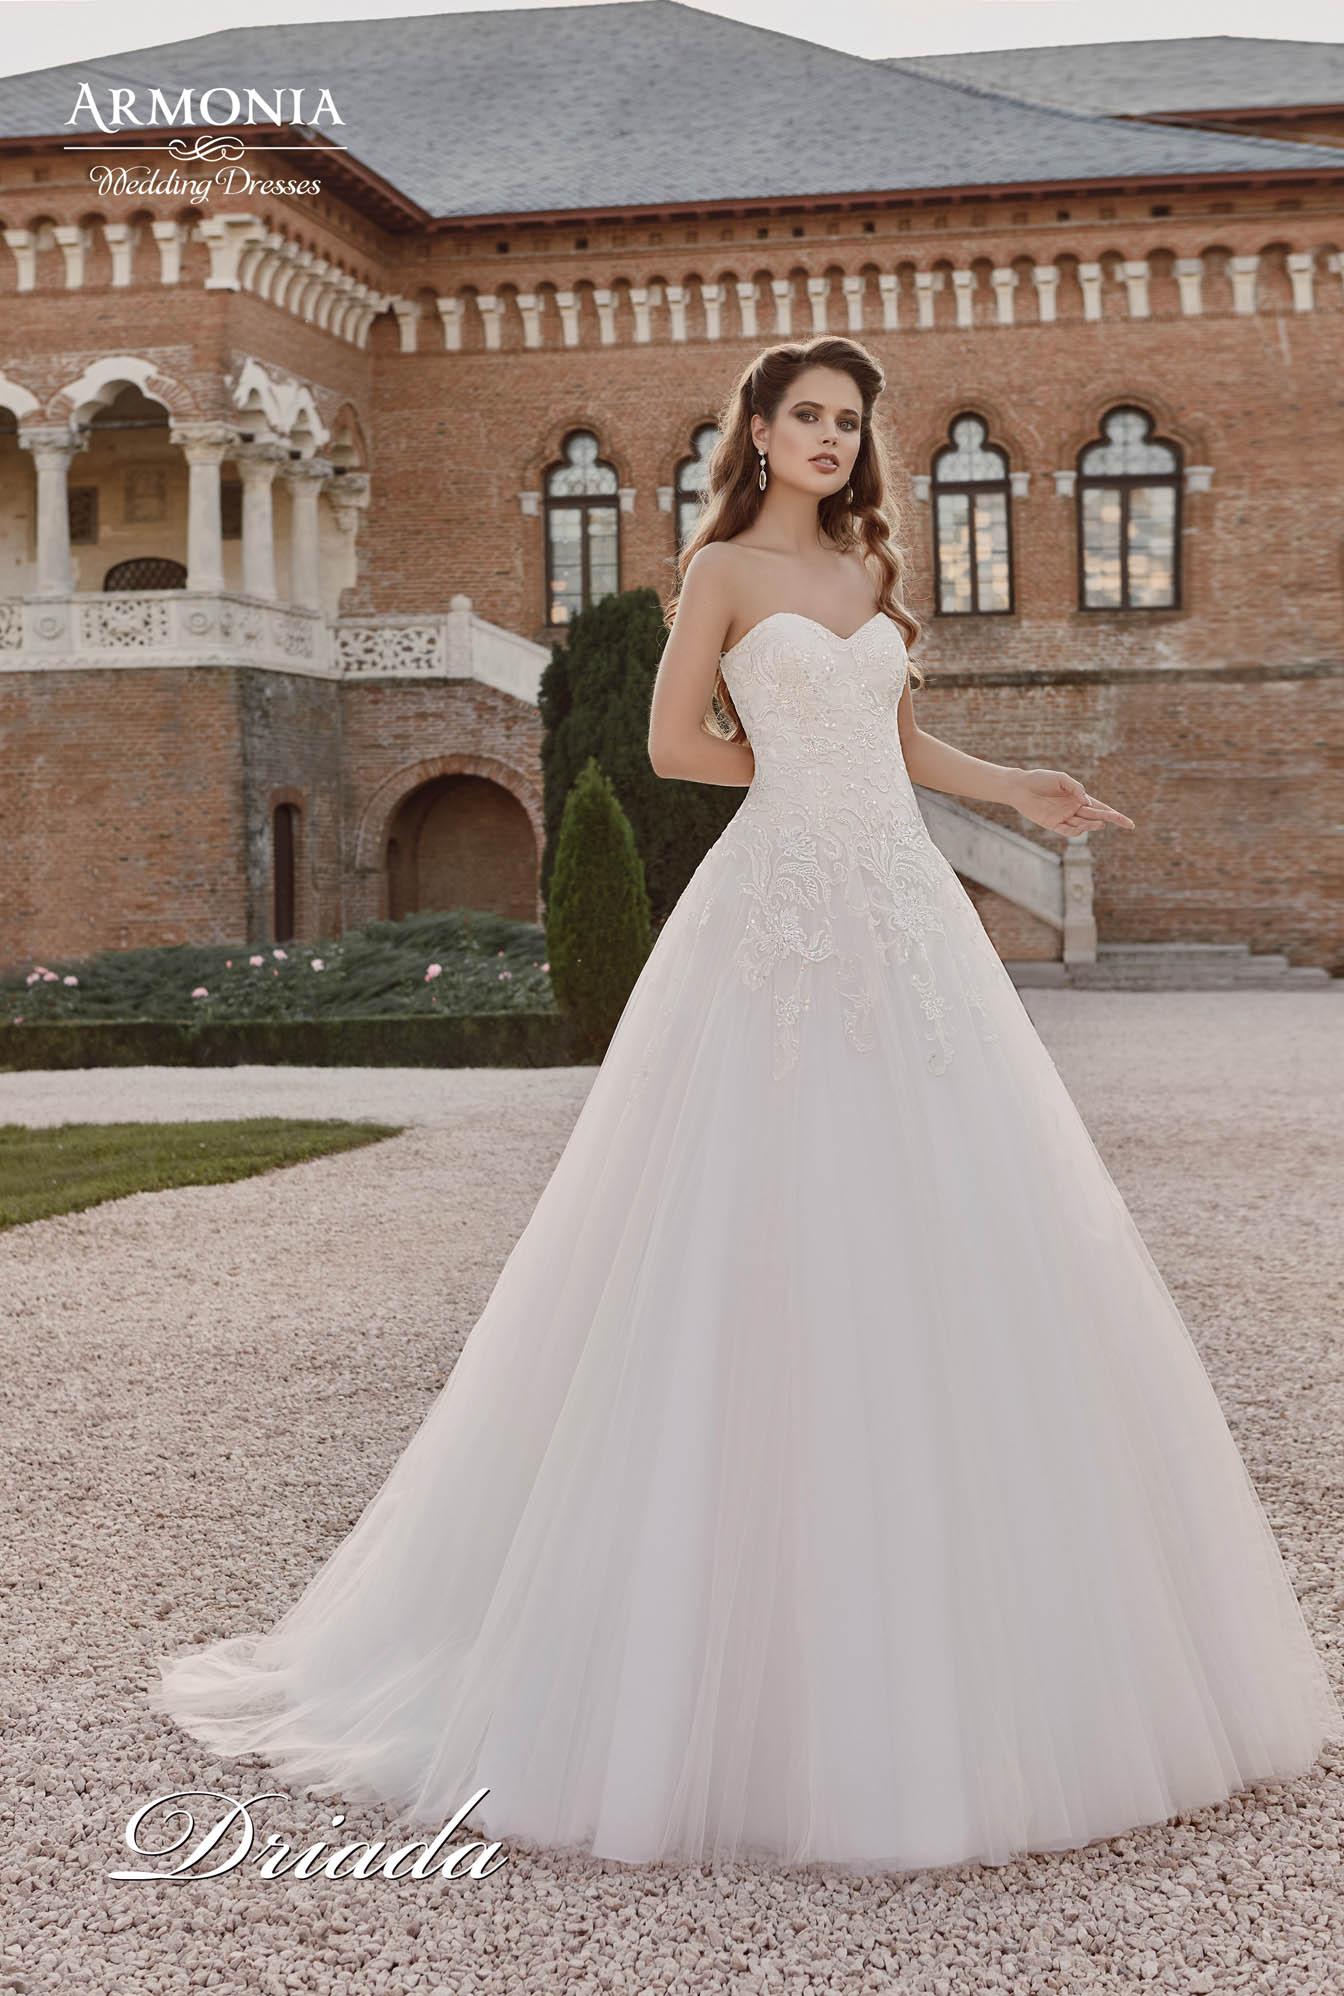 Свадебное платье Driada Armonia